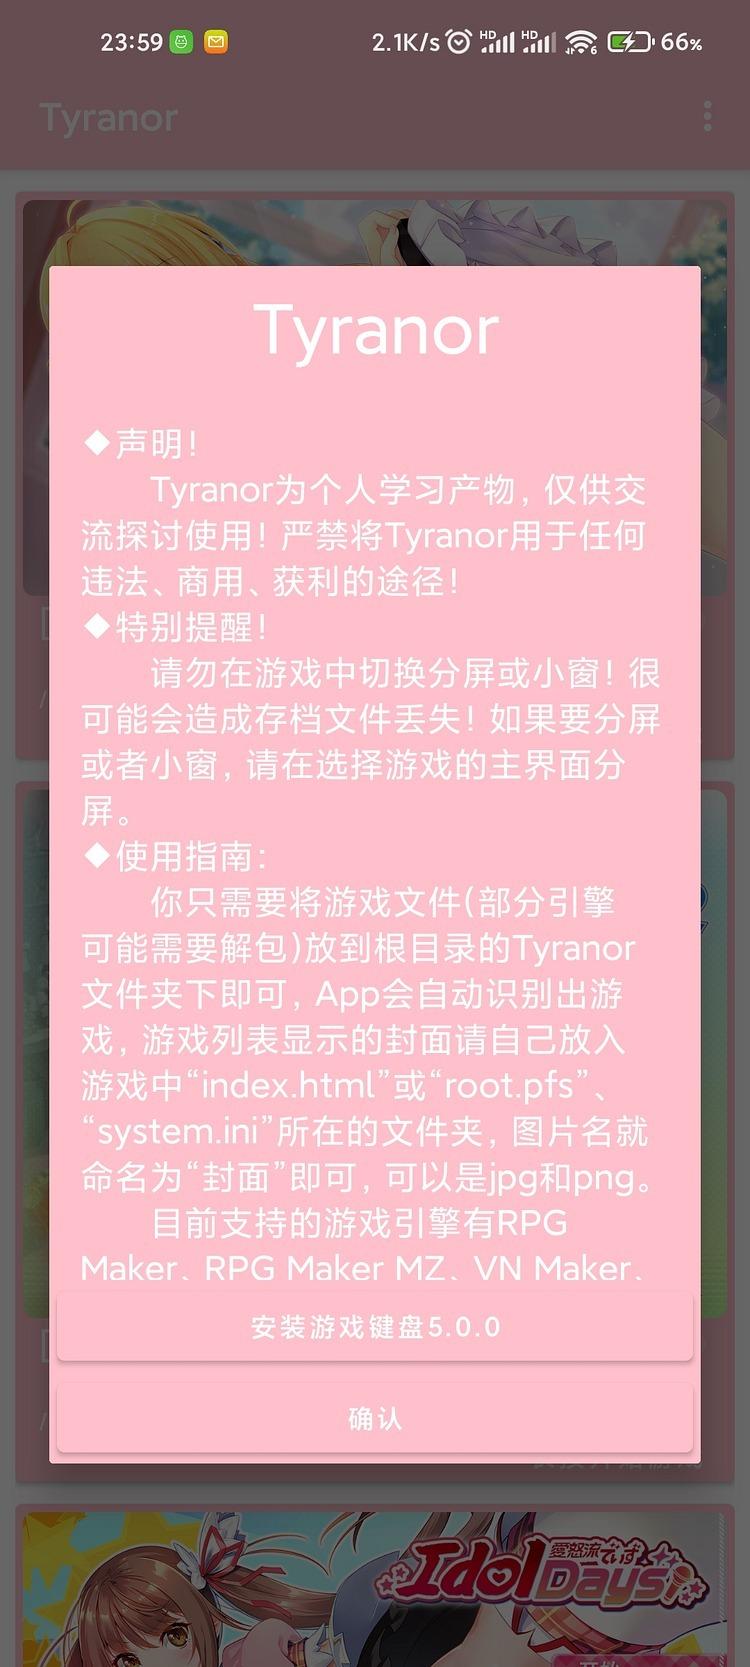 [安卓] Tyranor模拟器v1.4.7 1